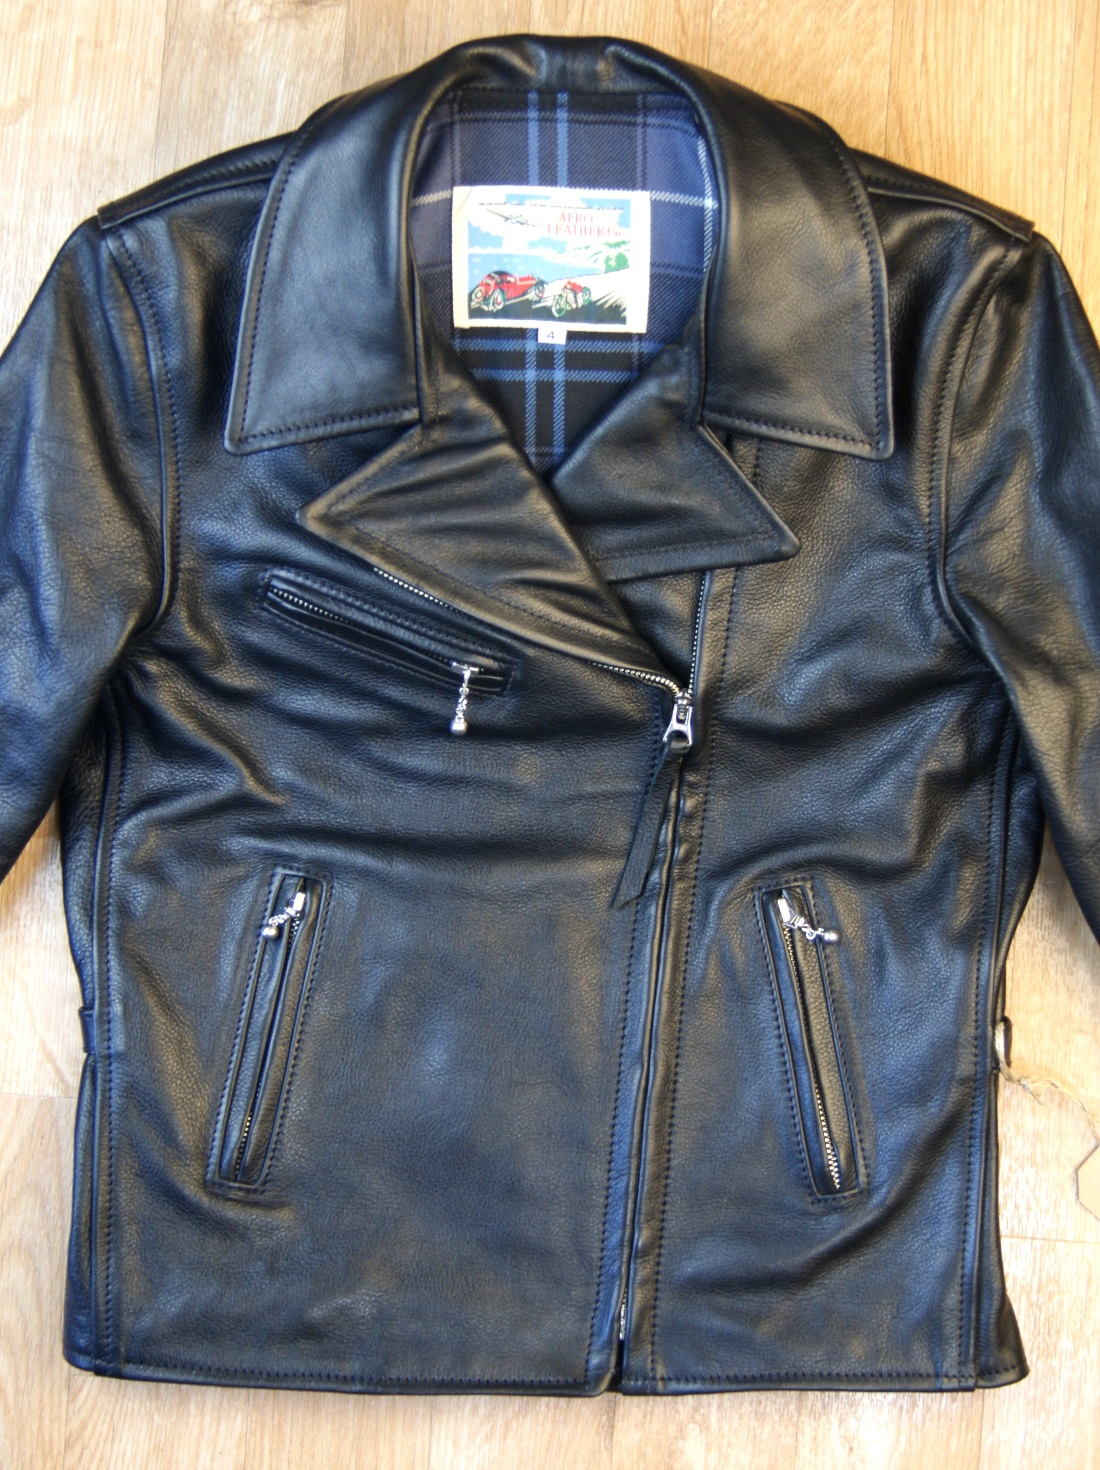 Aero Women's Hooch Hauler Black Vicenza Horsehide front.jpg